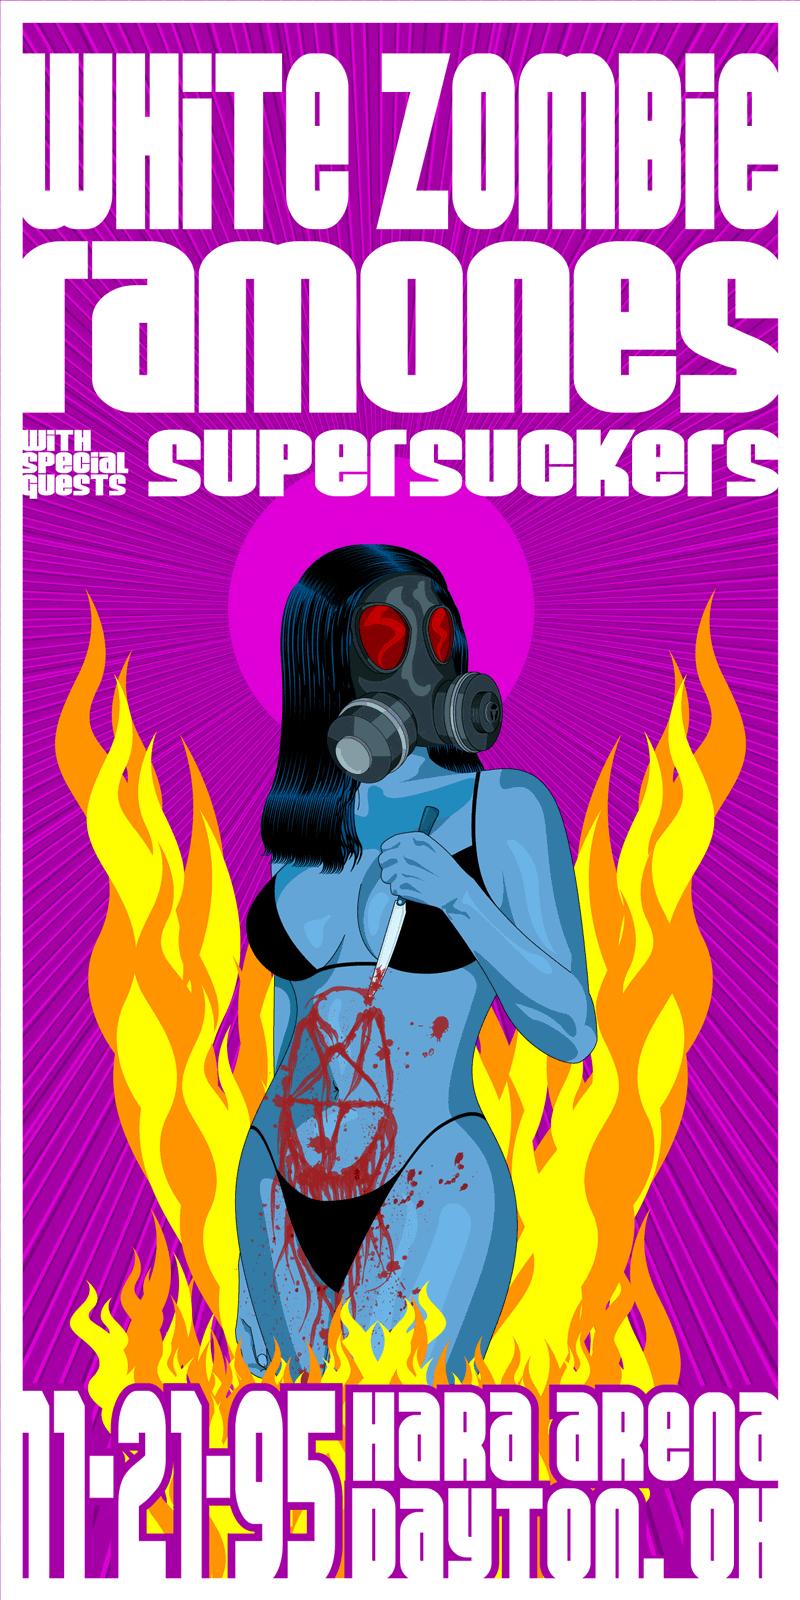 Ok, PANIC!: Rock Posters